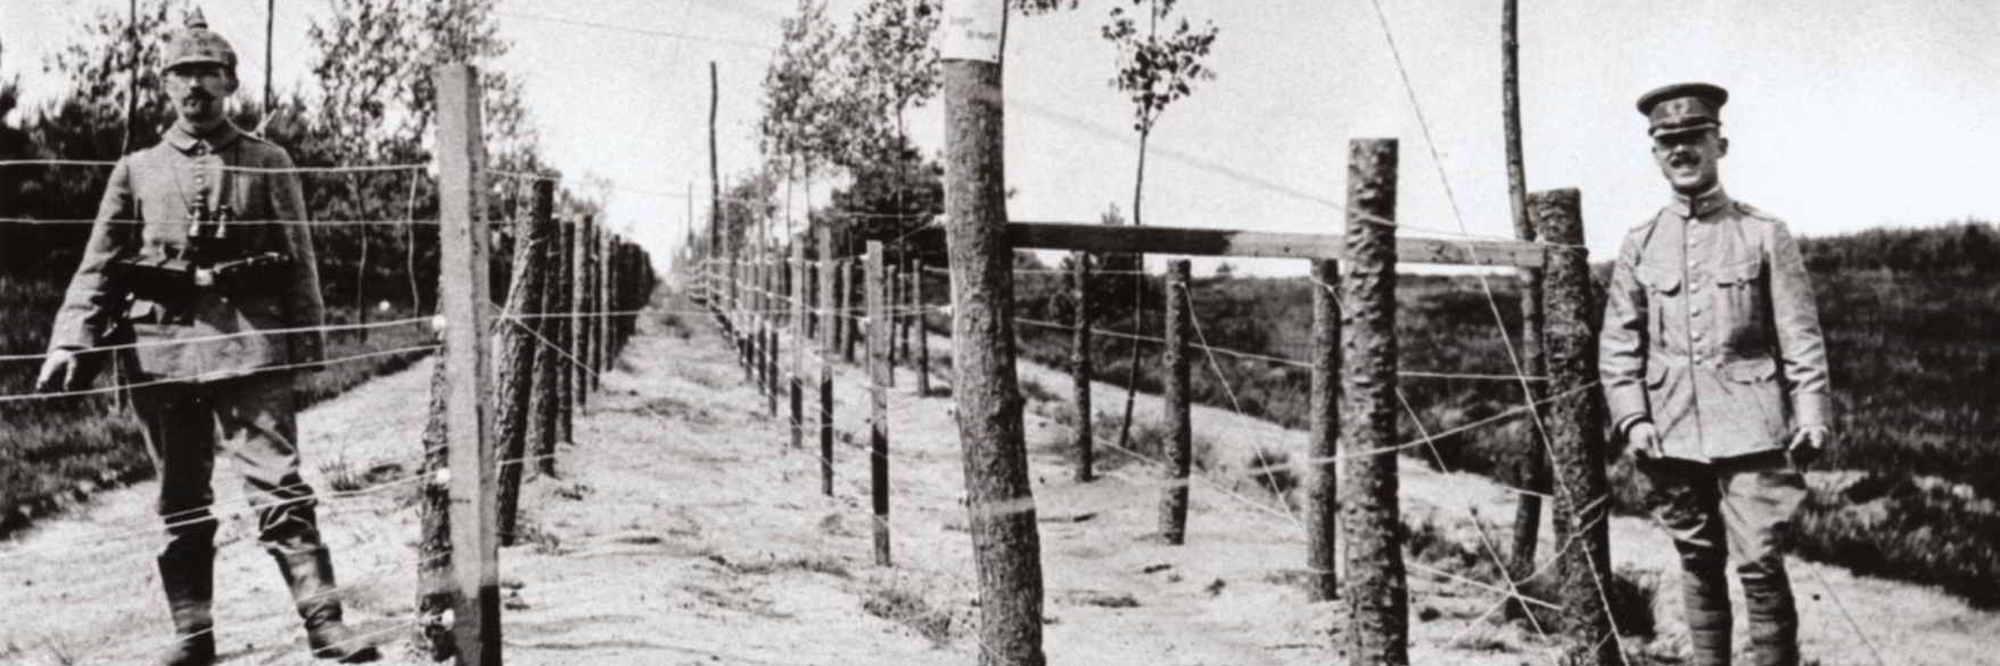 headerfoto Grensroute langs de Dodendraad